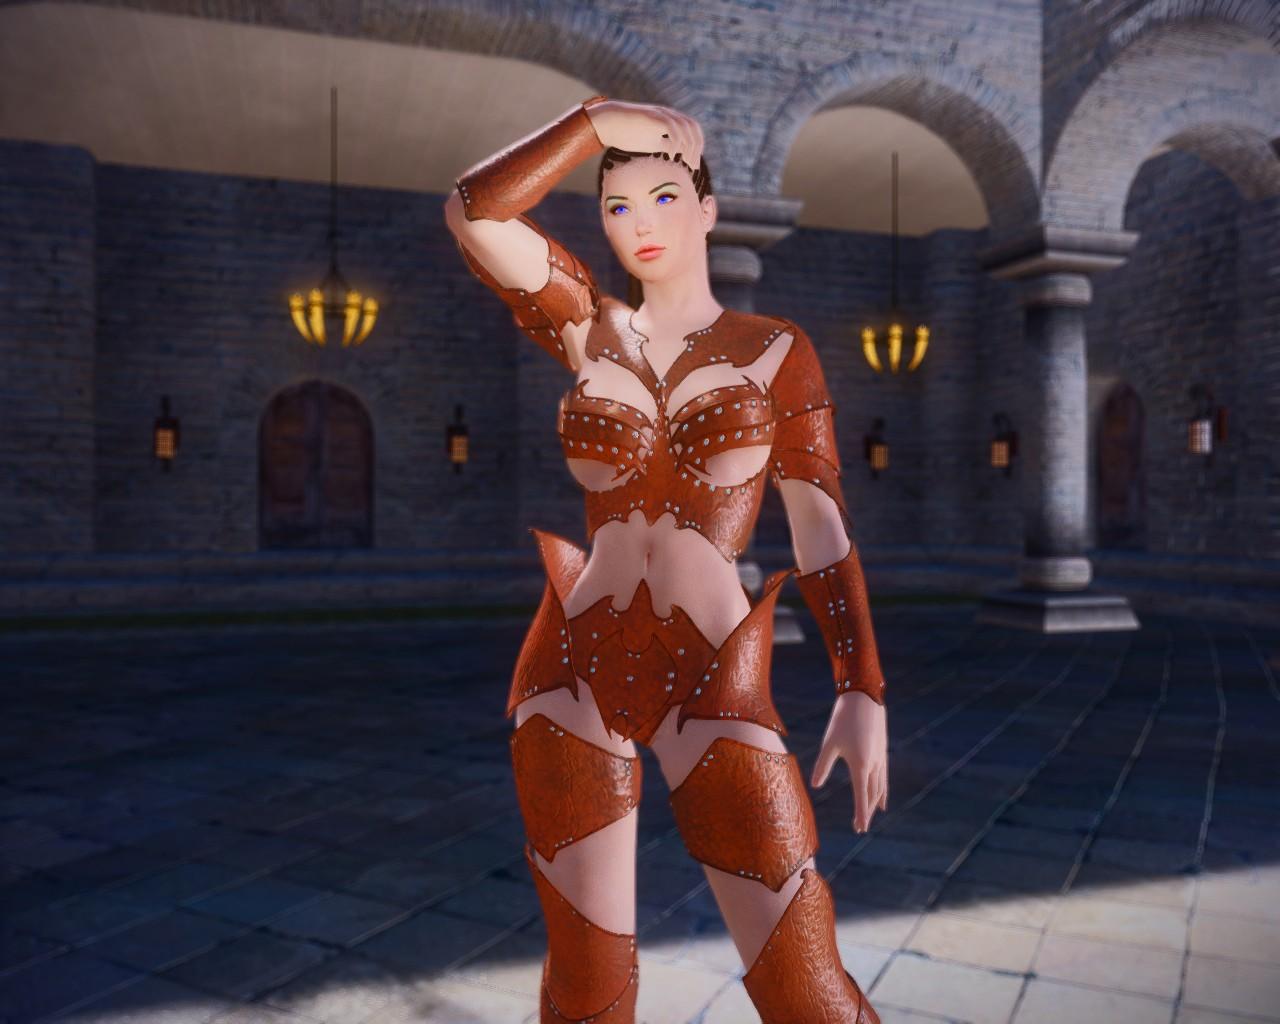 [Melodic] Tenera armor 00.jpg